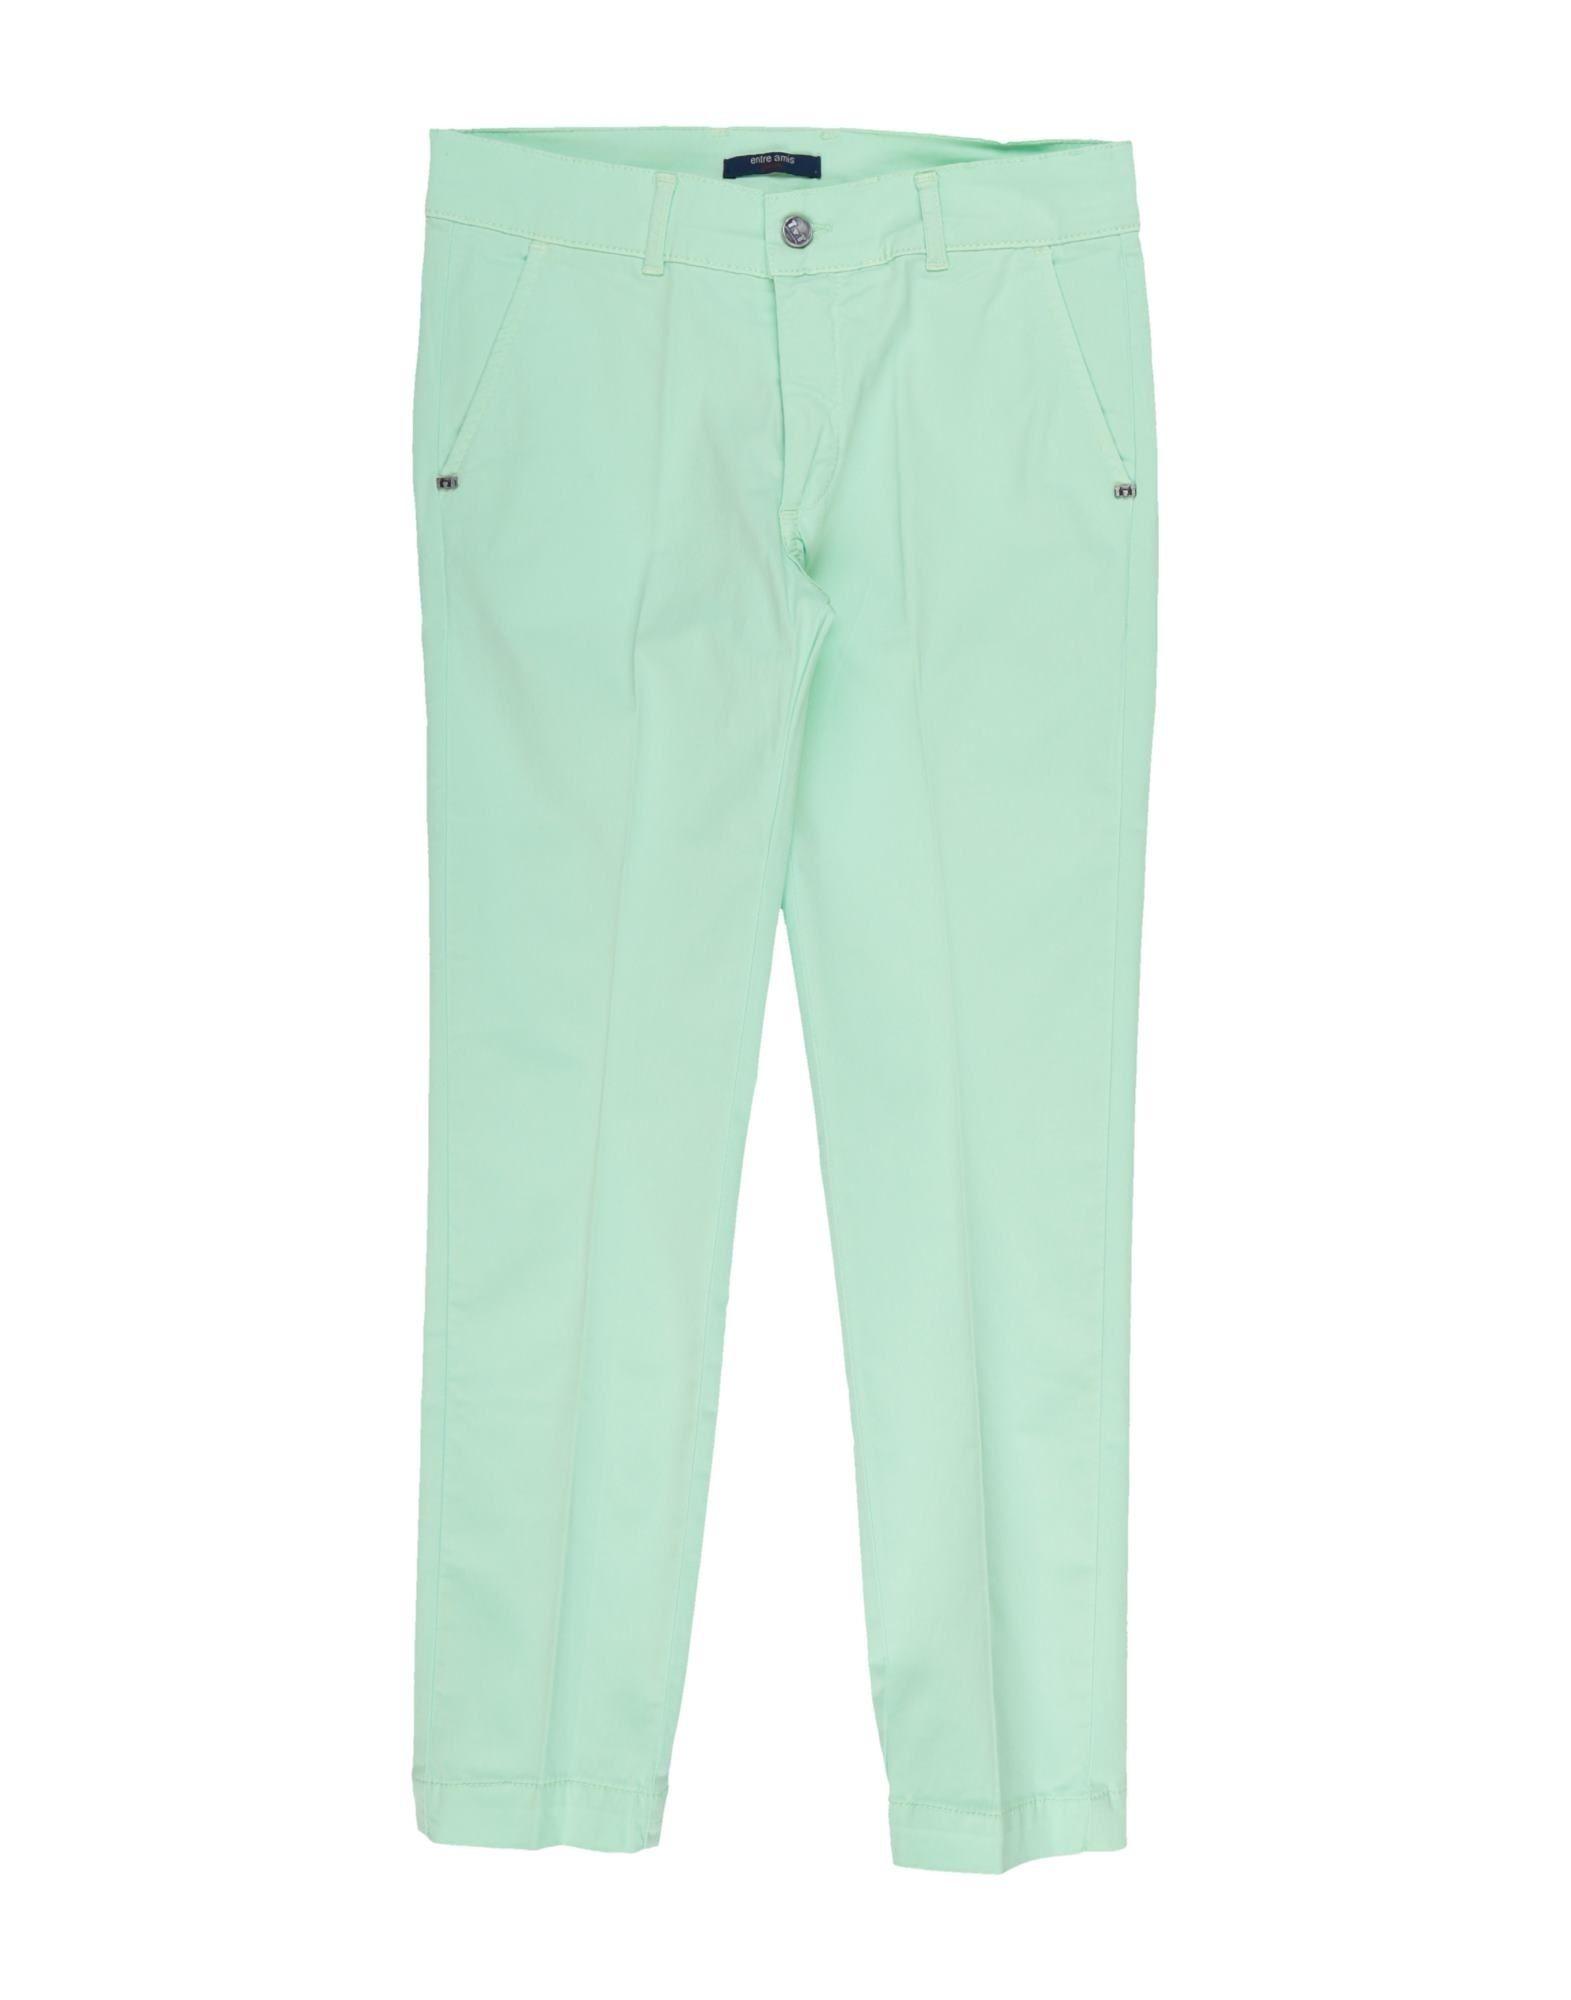 Entre Amis Garçon Kids' Casual Pants In Light Green